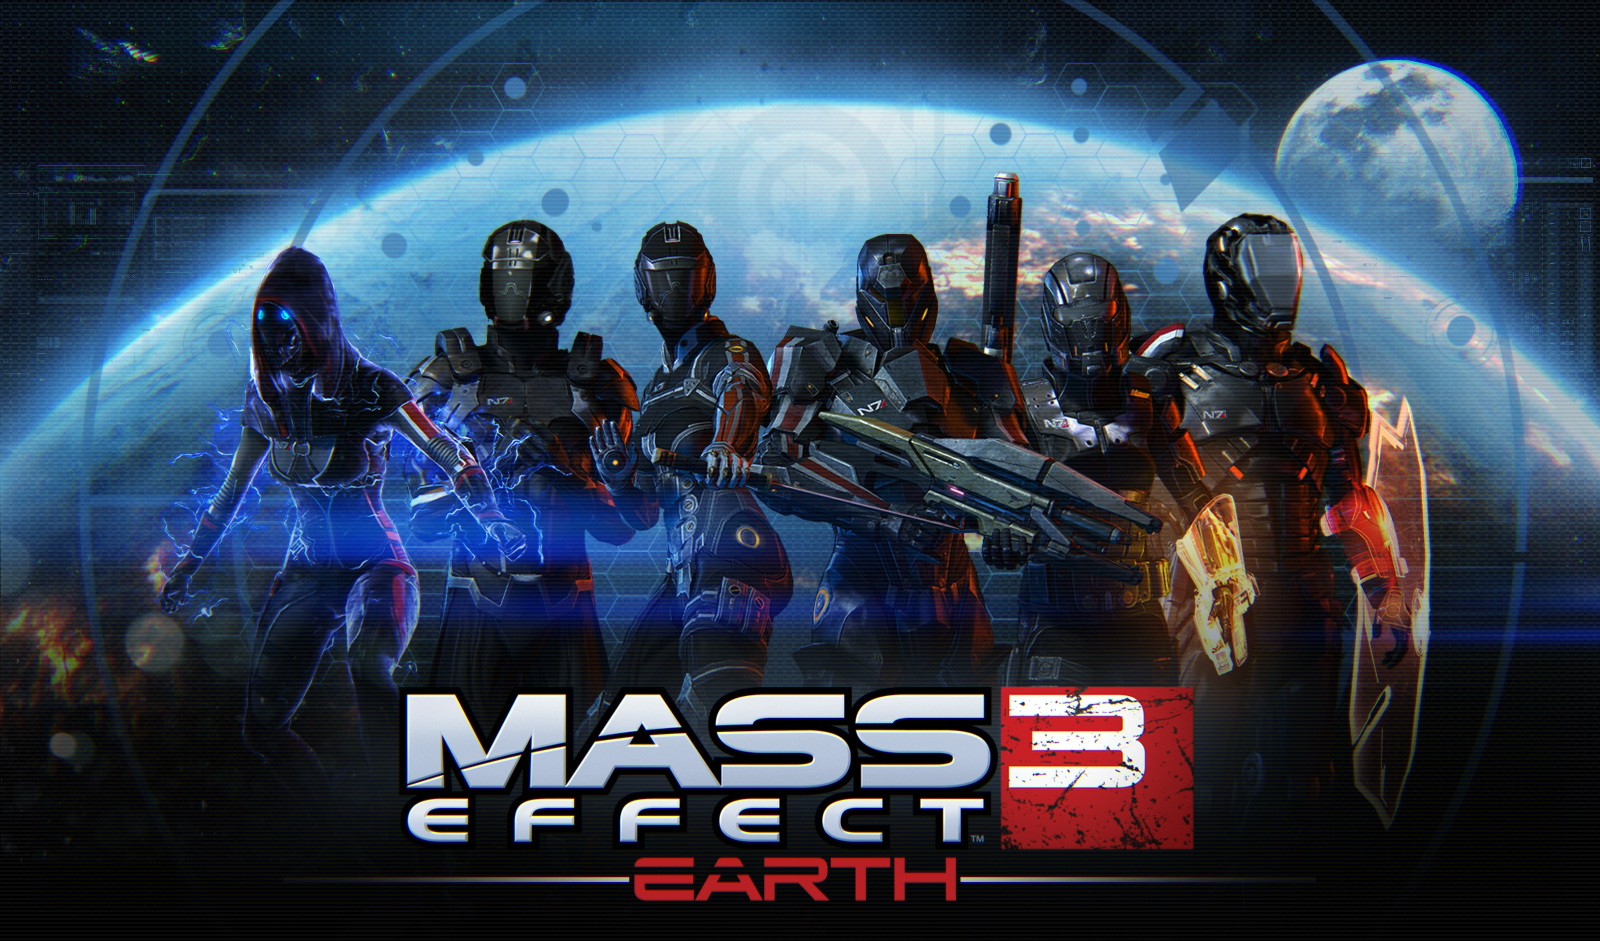 Mass Effect 3 Free Download, Mass Effect 3 Free Download